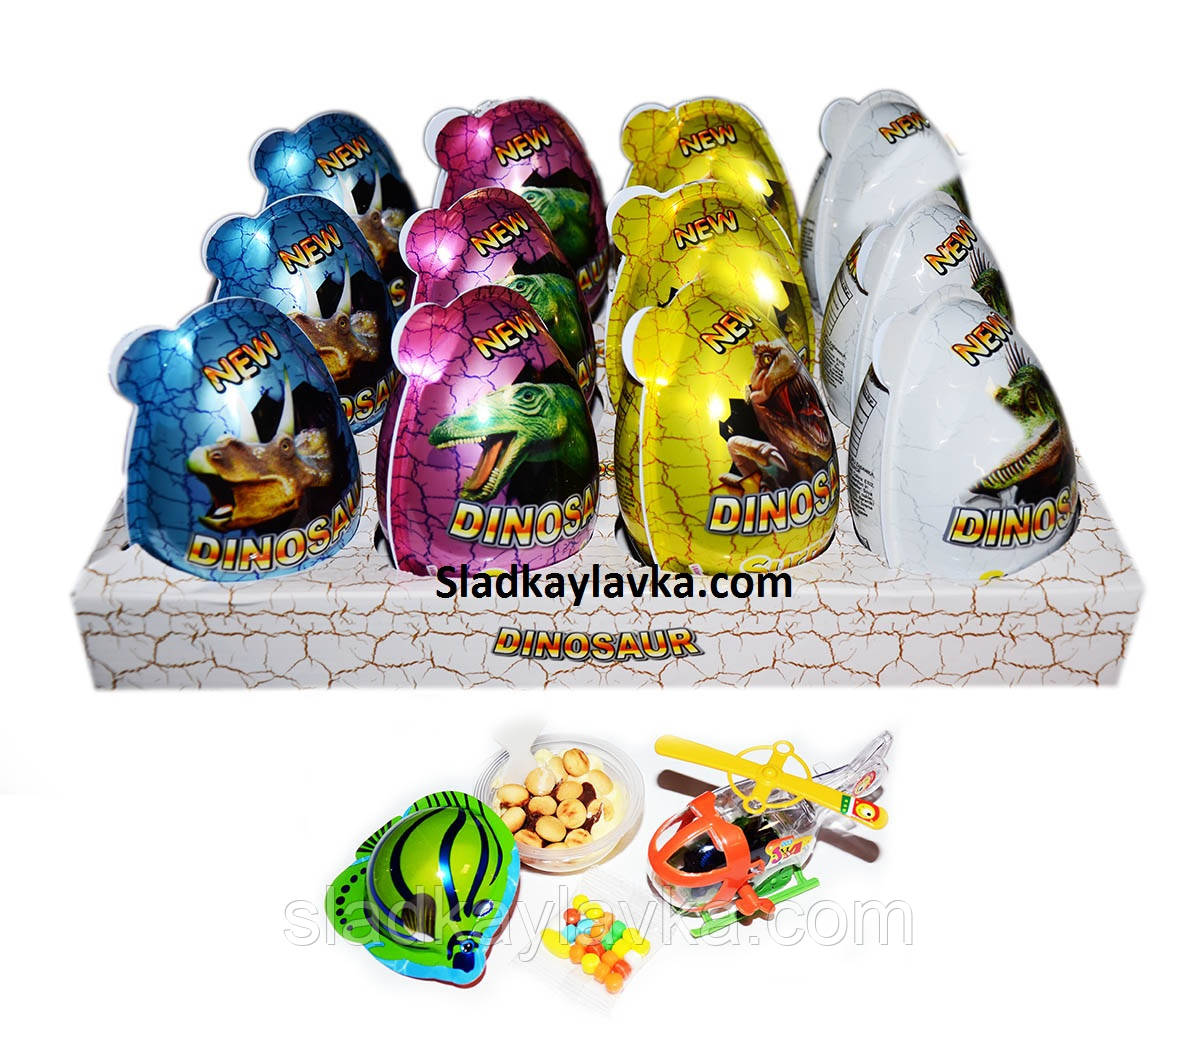 Яйцо шоколадное пластиковое Toy Egg Max Dinosaur 12 шт, 15 гр (China)